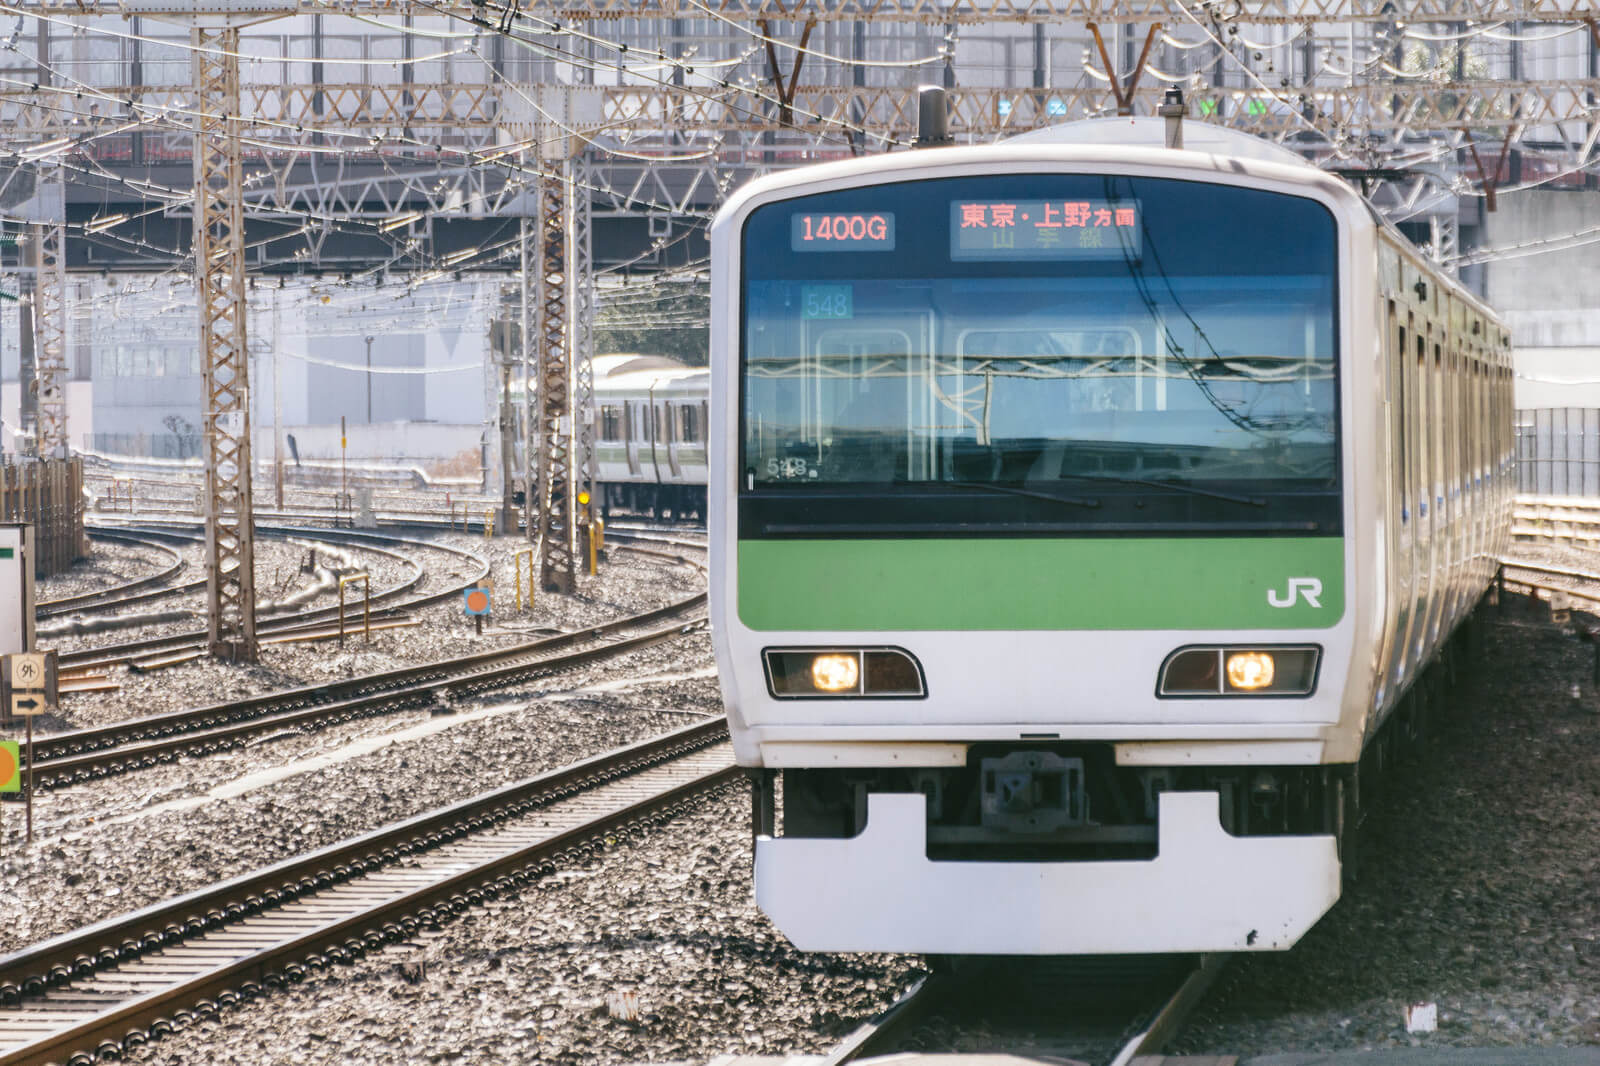 【TRAVEL Q&A】利用東京1日乘車券省錢觀光!關於1 Day Pass的相關問題統整 MMNQA、